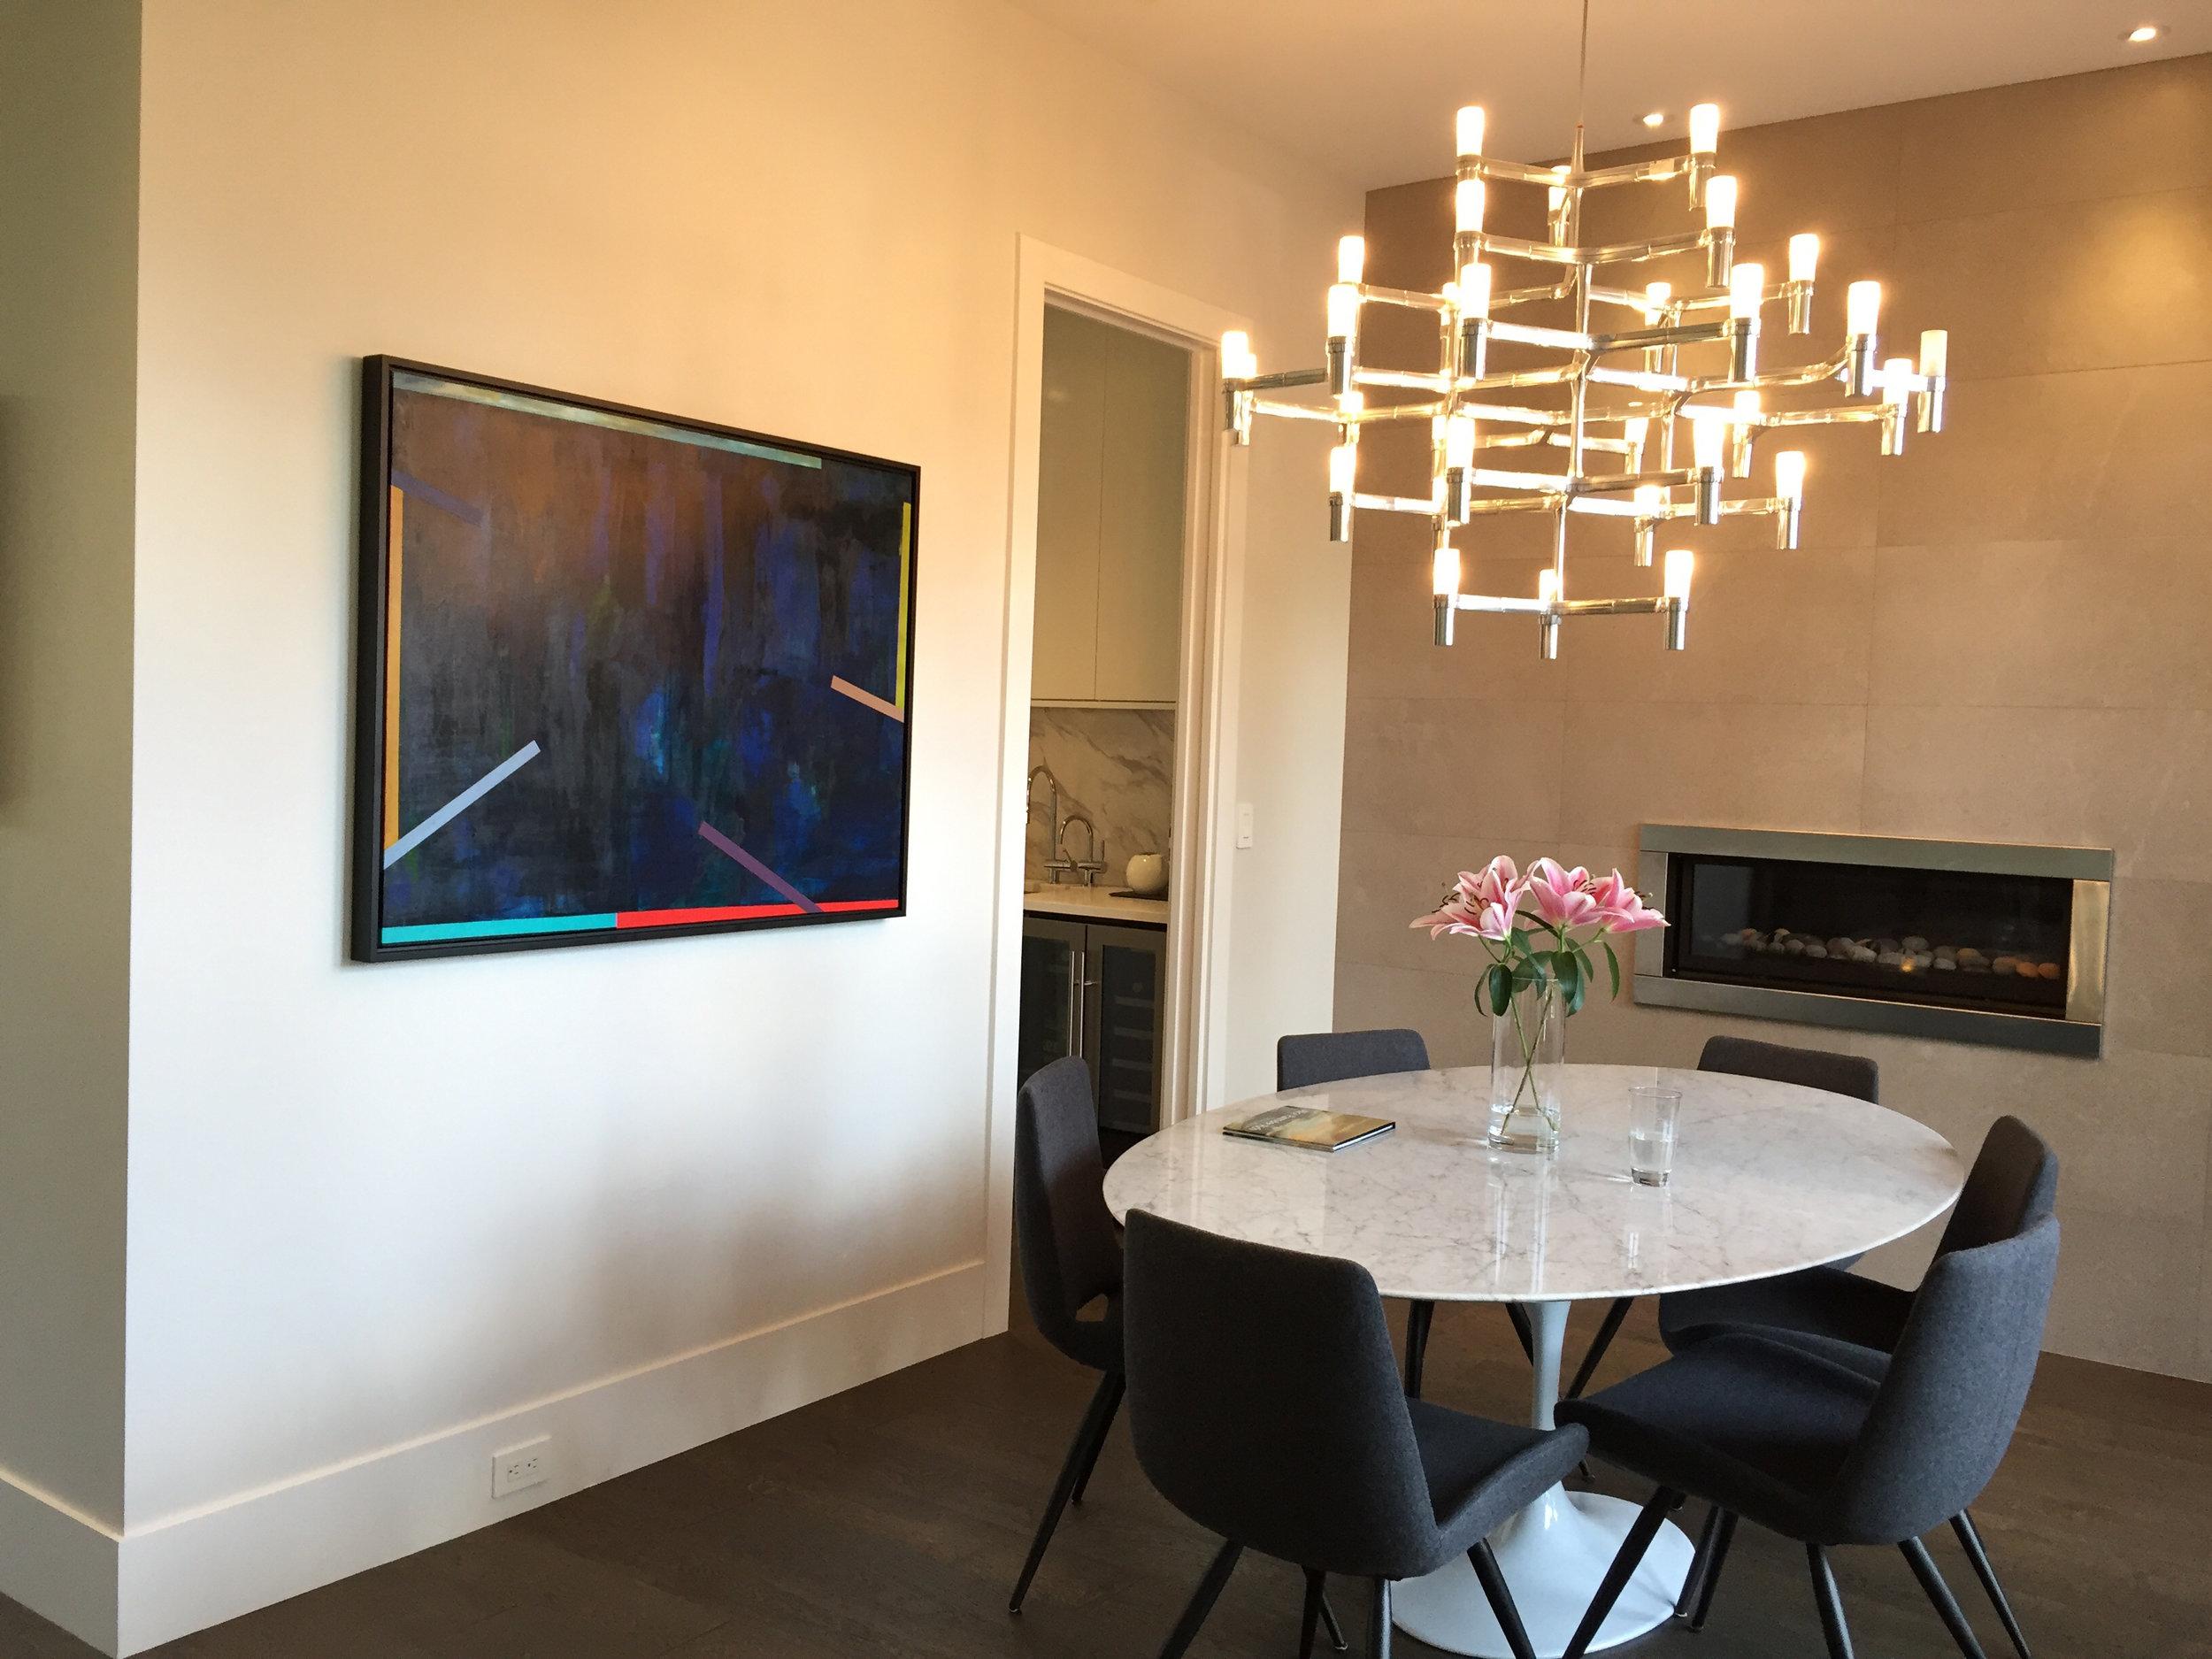 Installation, Dining room,Open Space in situ.jpg